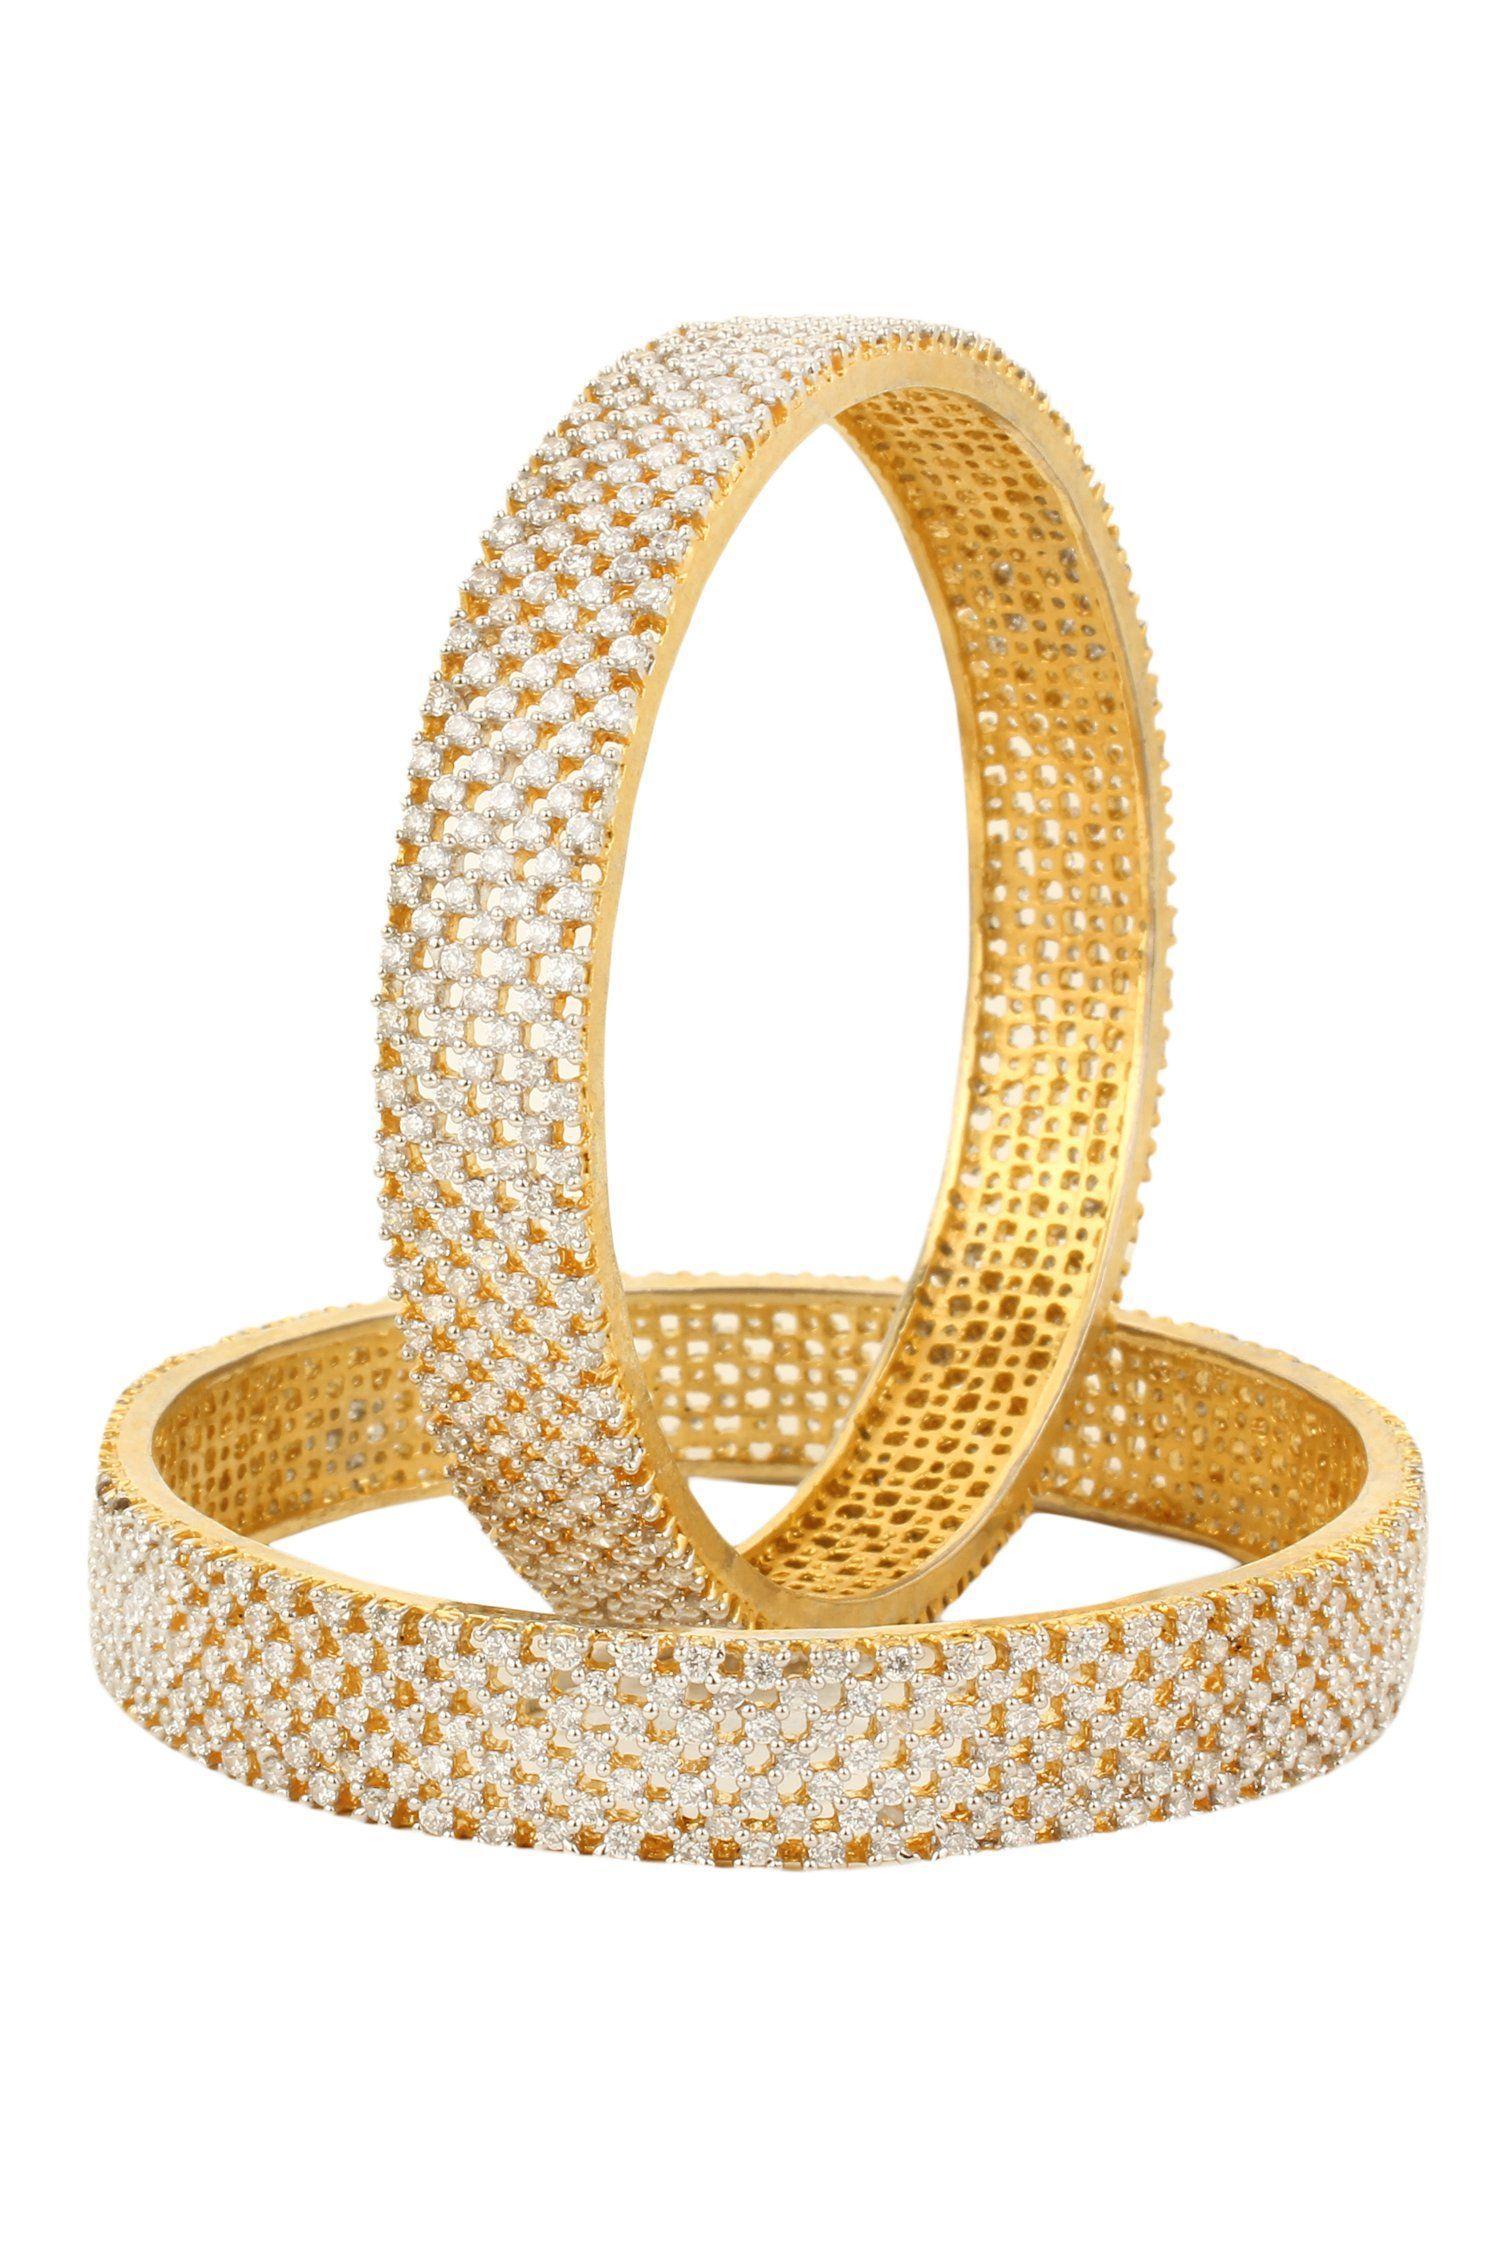 Dilan jewels happiness collection shimmer wedding diamond imitation